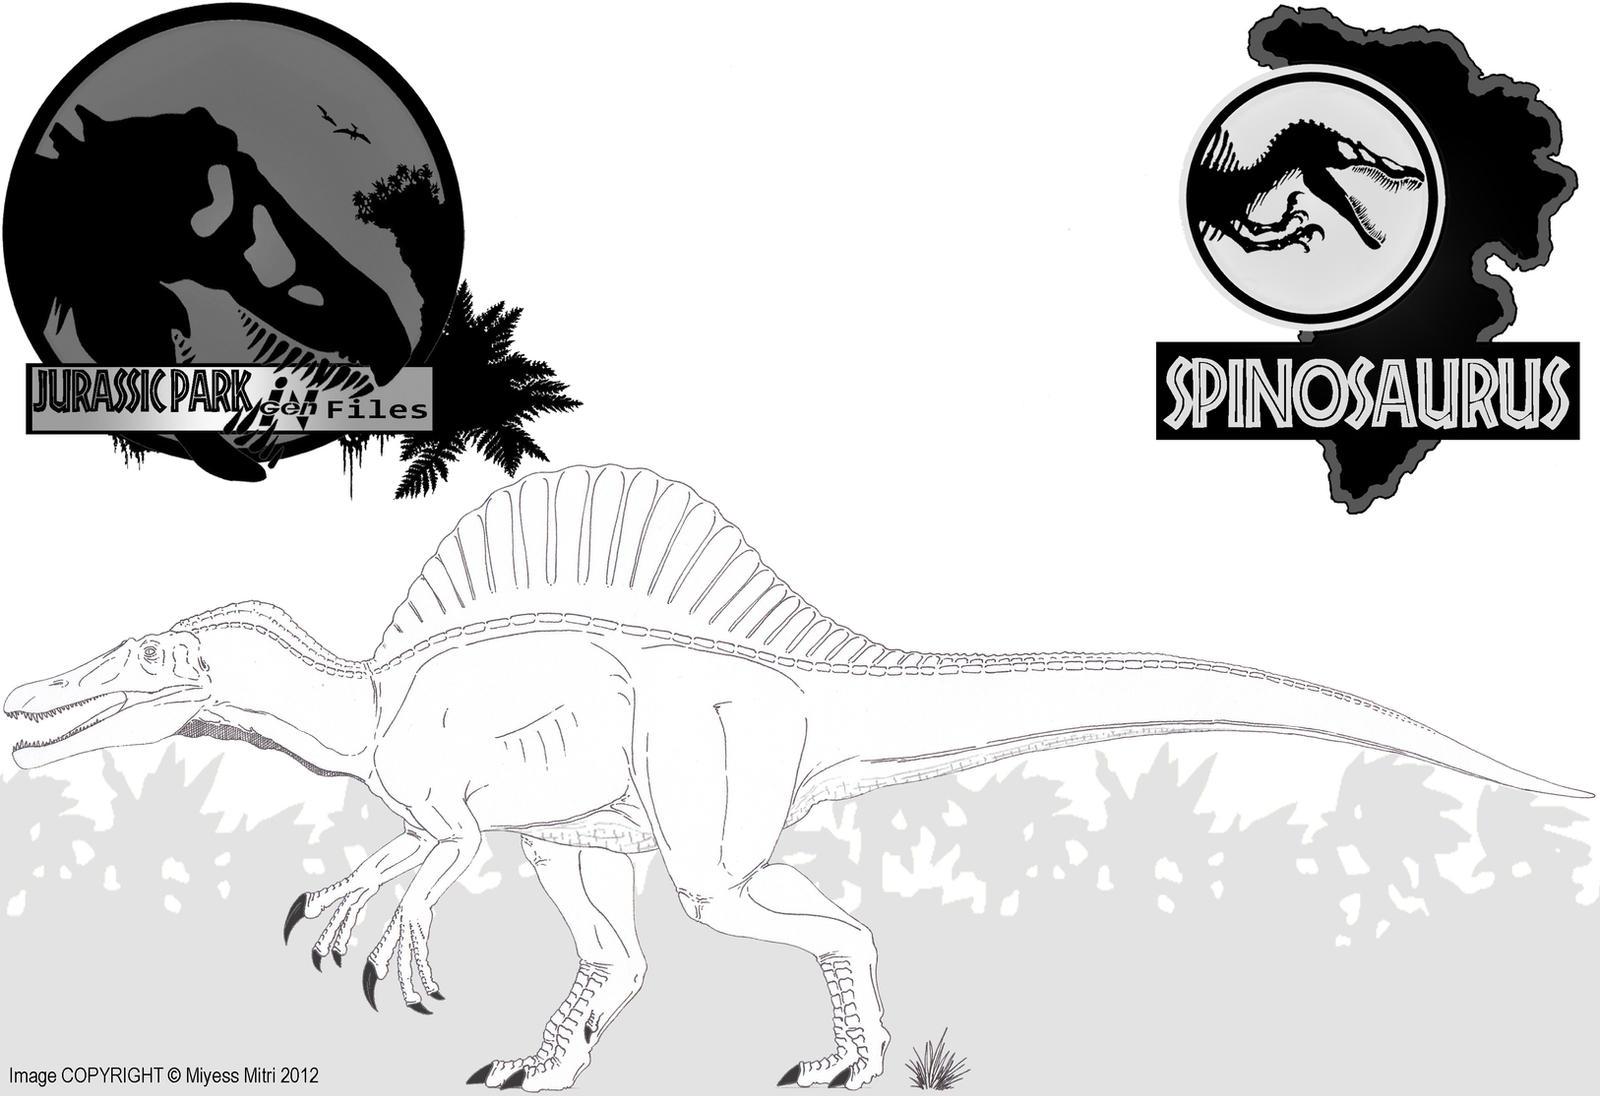 spinosaurus_beta_version_ii_by_miyess-d4uyl17